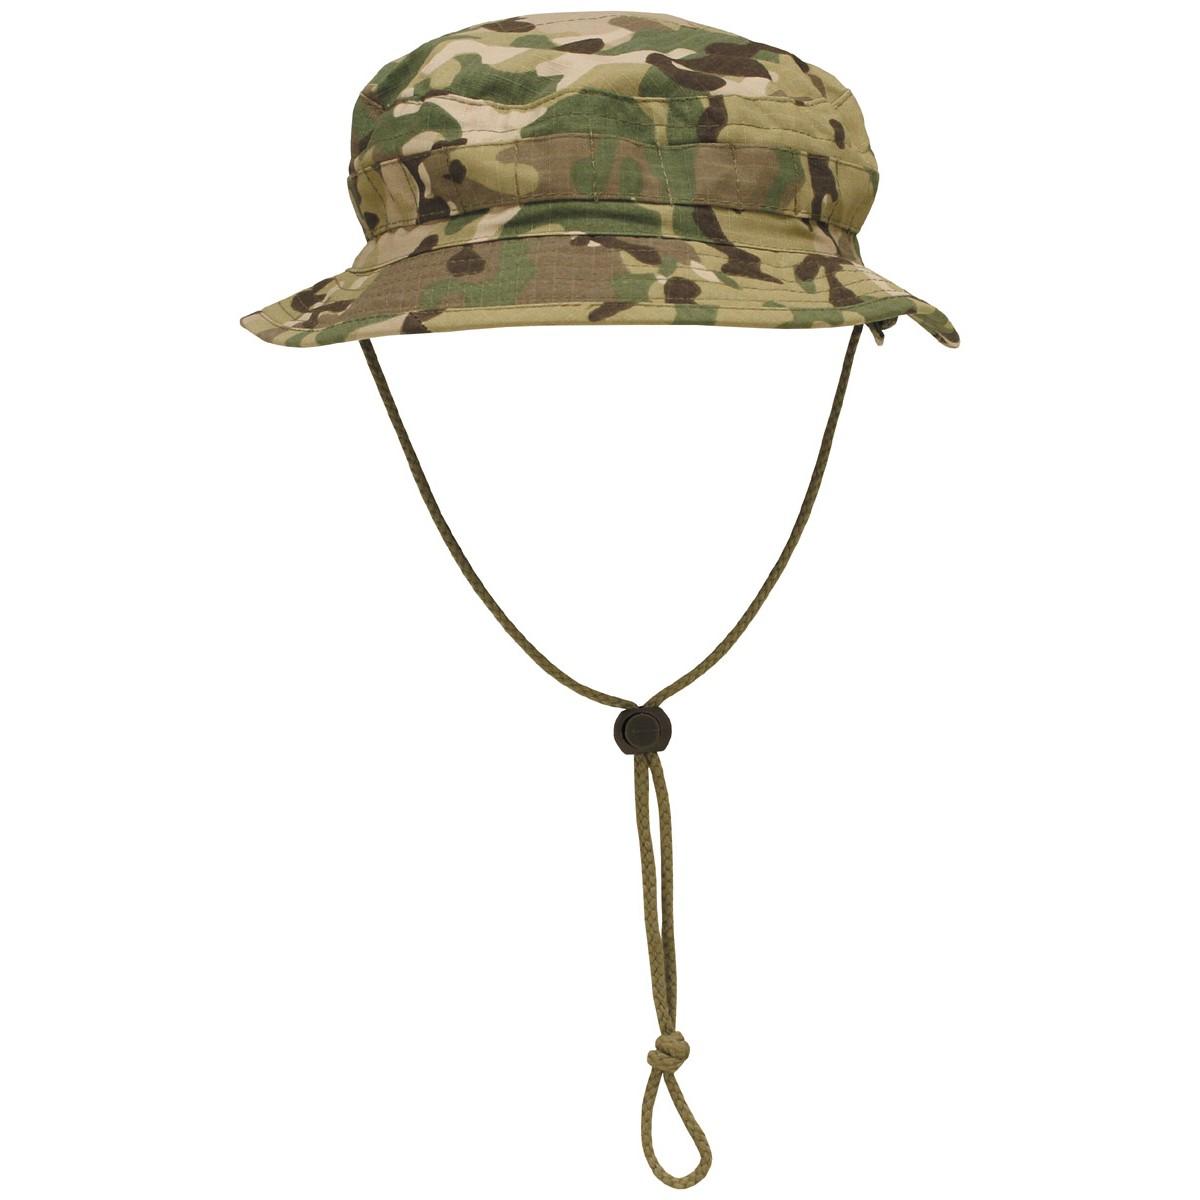 Bush hat šešir rip stop operation camo